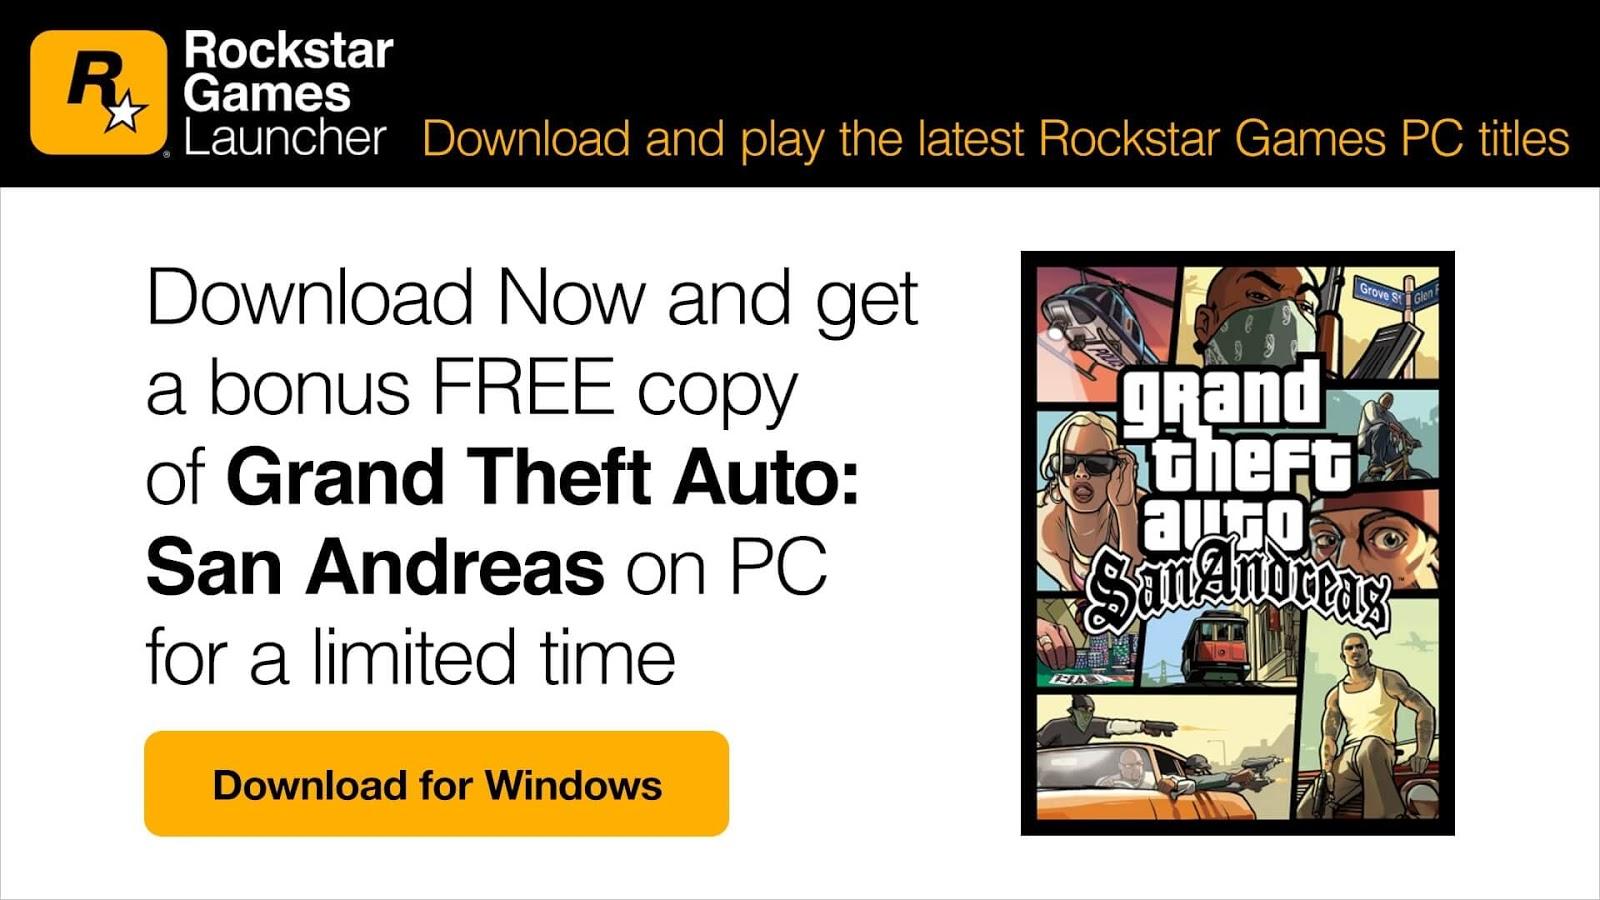 Grand Theft Auto San Andreas: Αποκτήστε το εντελώς δωρεάν!!